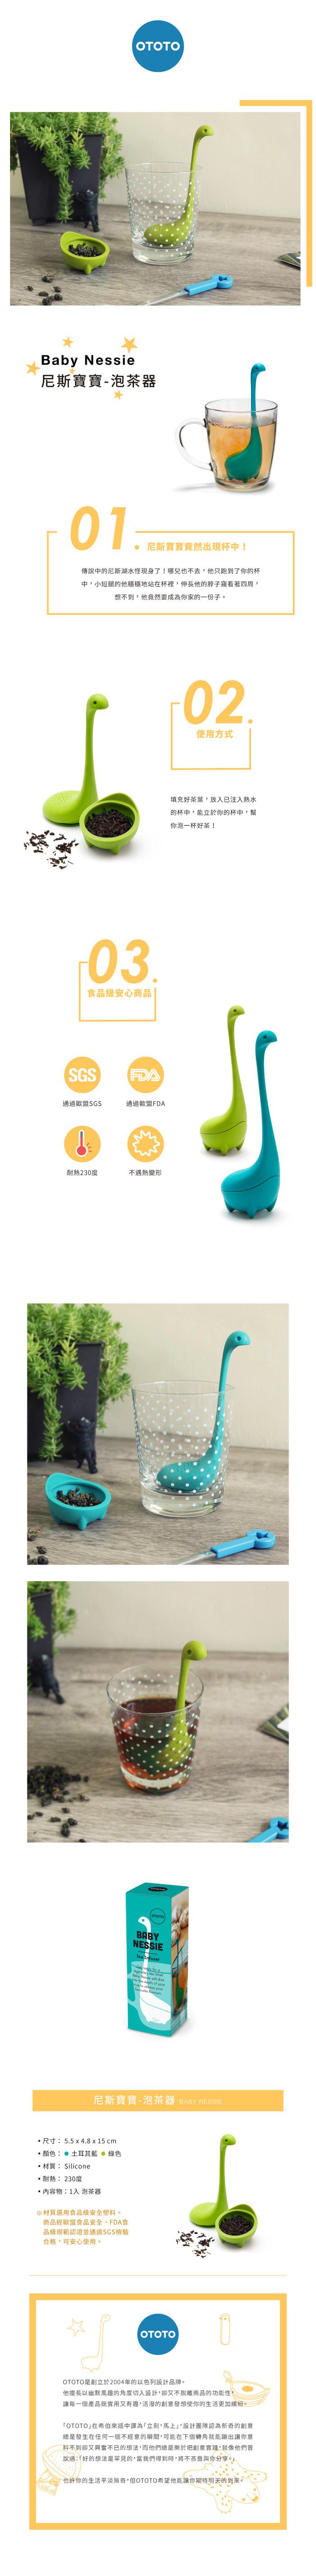 OTOTO|尼斯寶寶-泡茶器